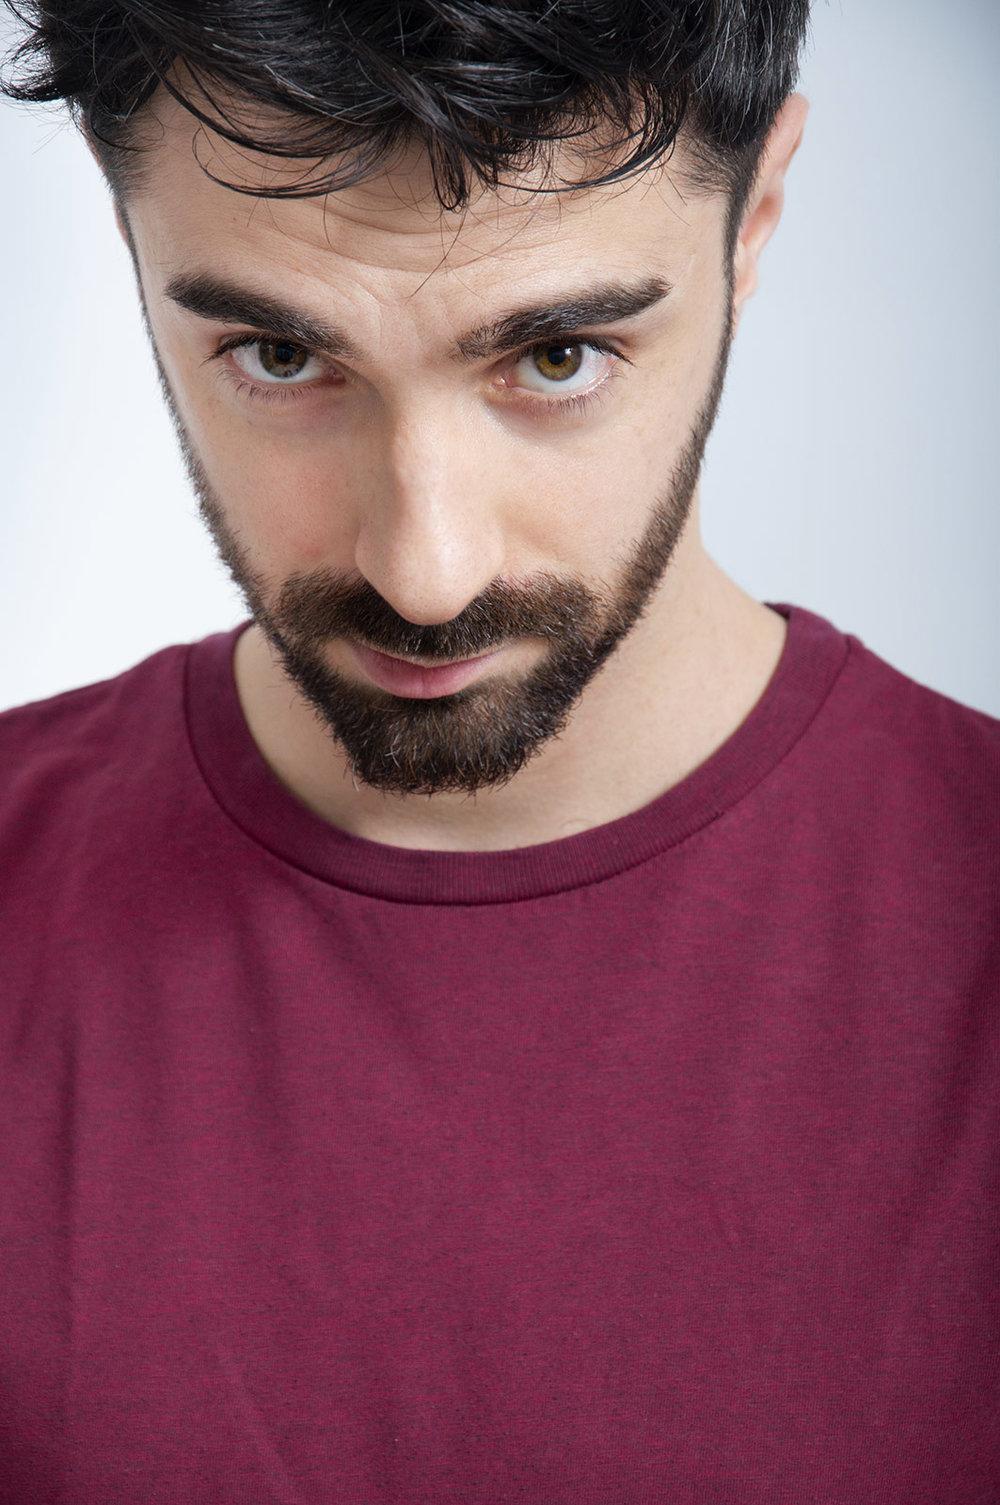 Foto: Gianluigi Sansonetti